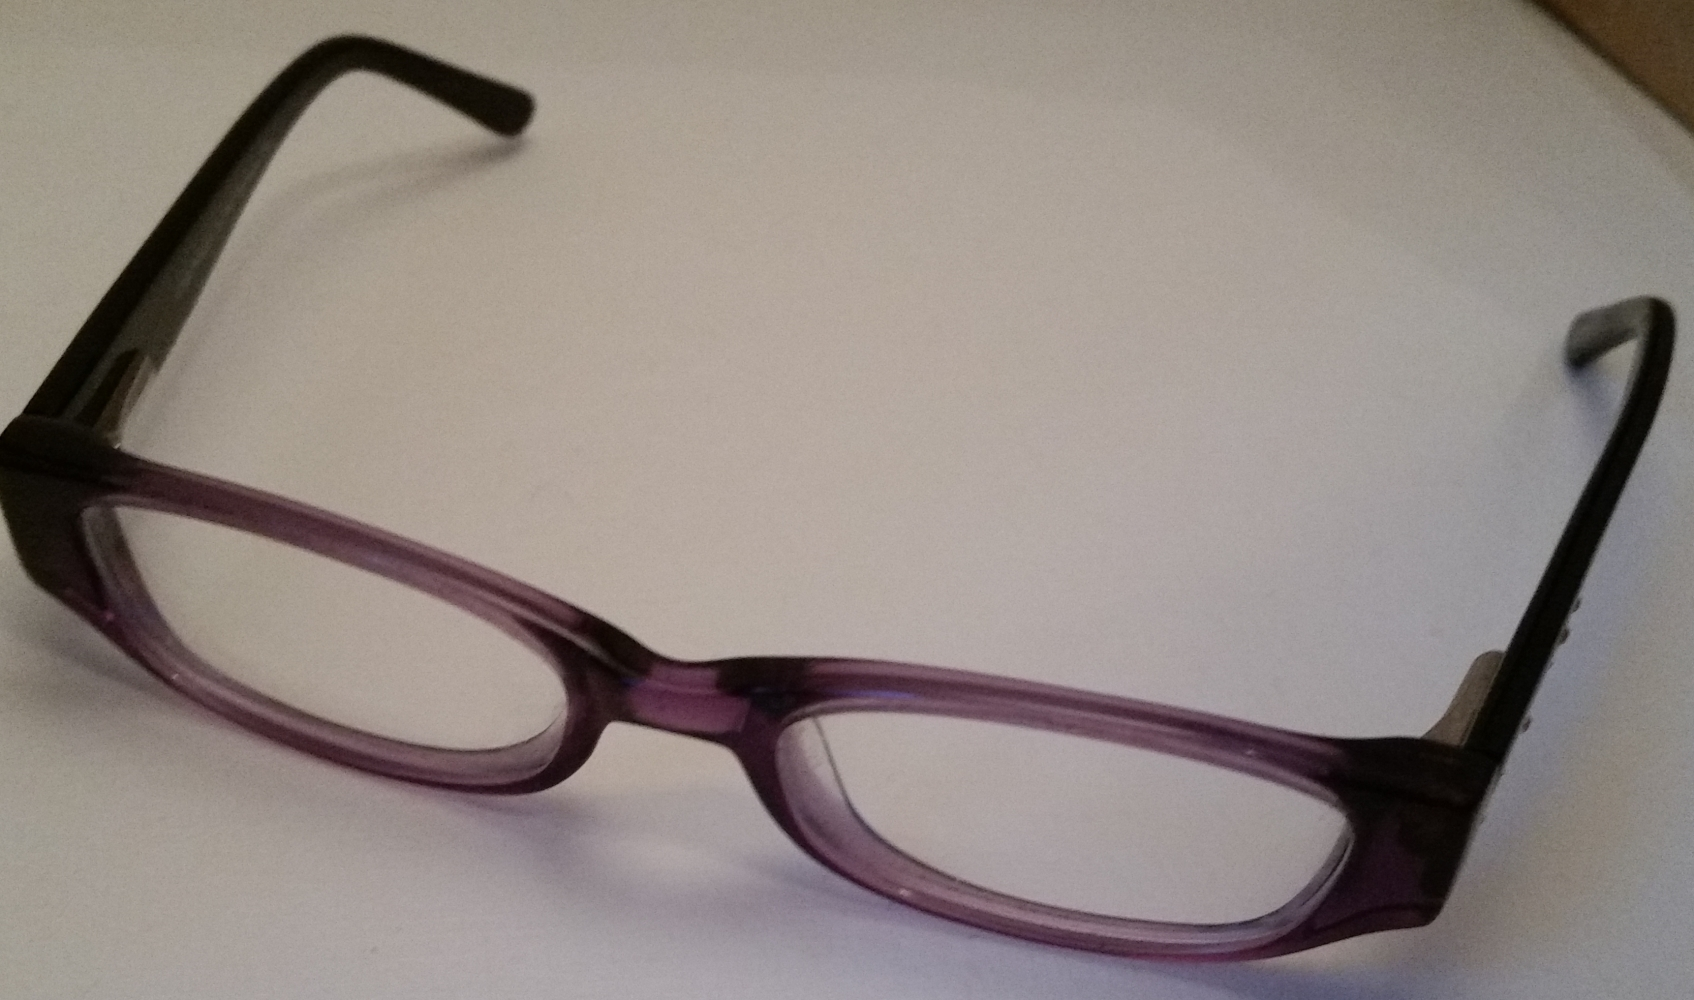 2ed8be64532 Emporio Armani Eyeglasses Costco - Bitterroot Public Library